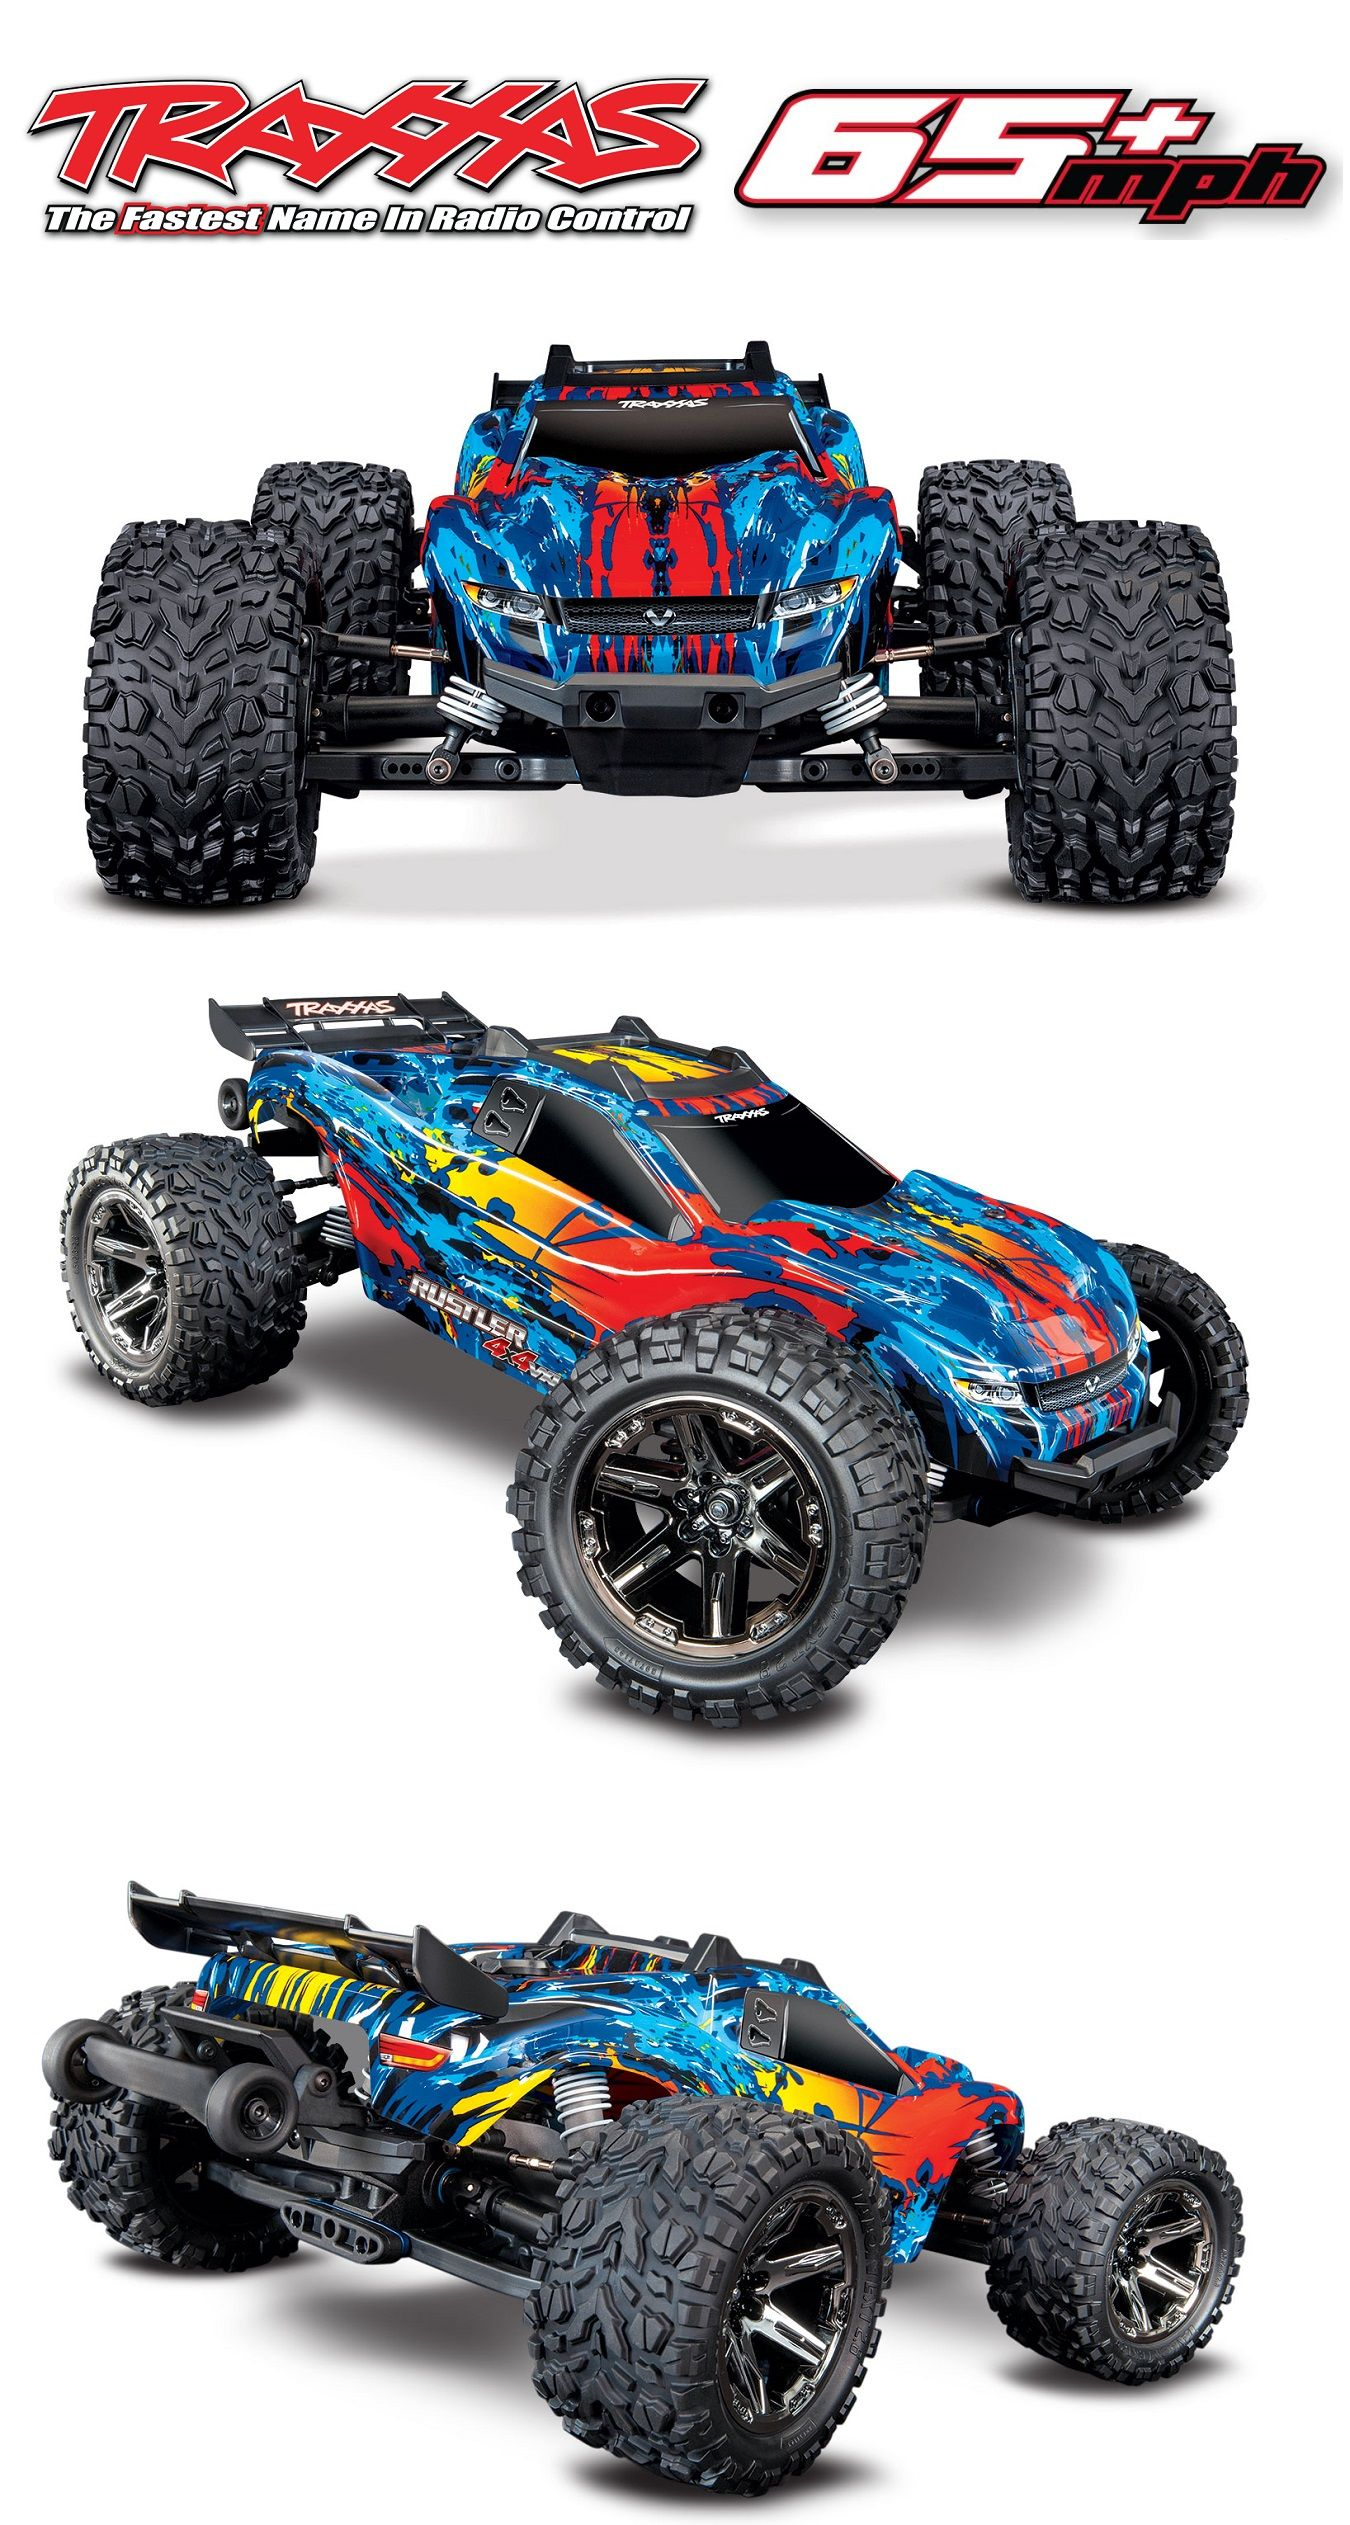 All New Traxxas Rustler 4x4 Vxl Rc Stadium Truck Coming Soon Traxxas Rustler Traxxas Rc Cars Traxxas